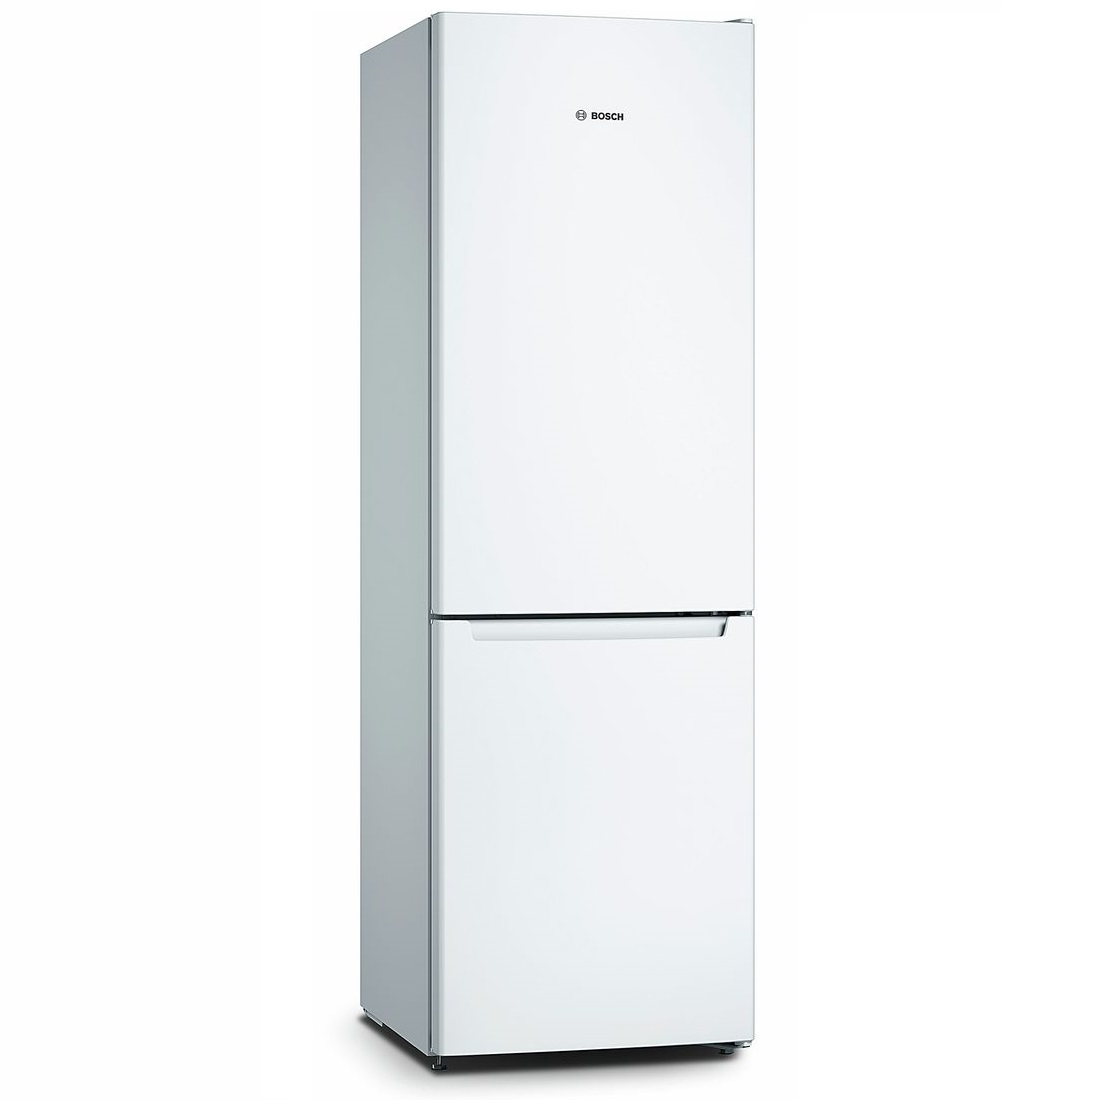 Bosch kombinovani frižider KGN36NW30 - Inelektronik